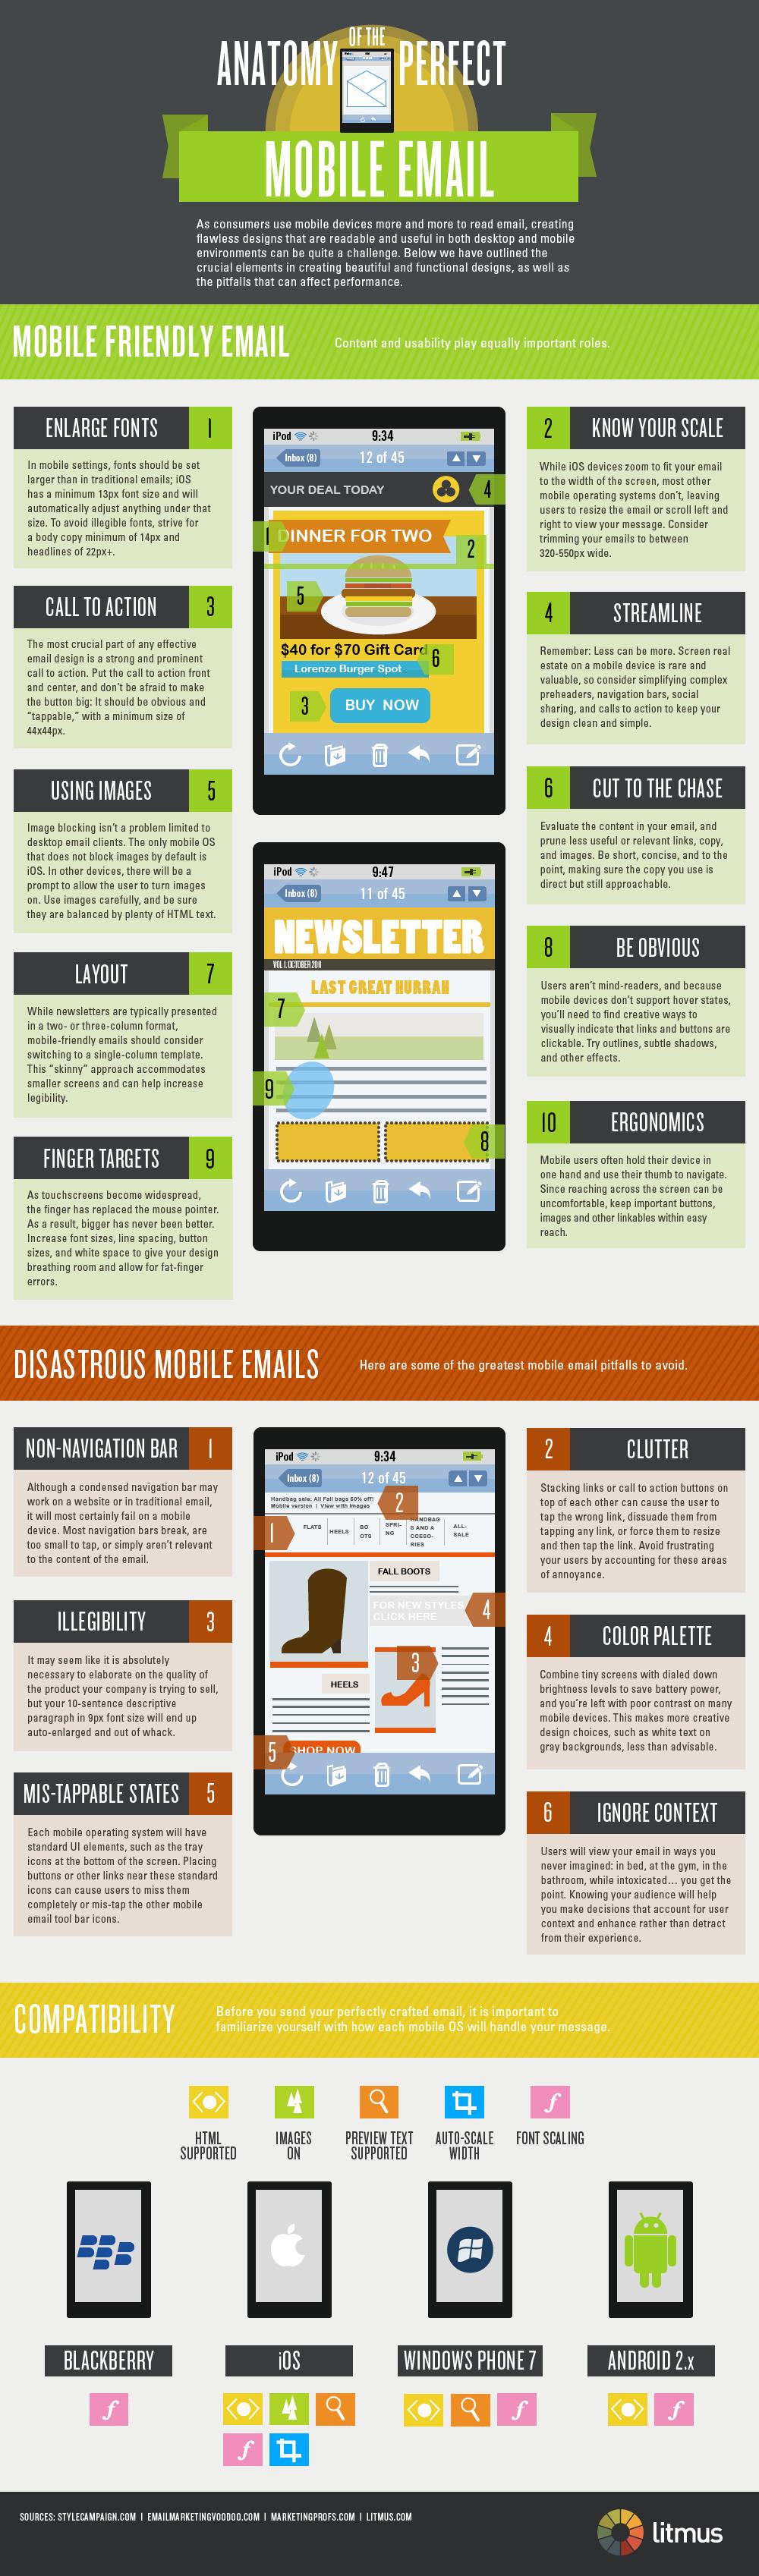 Infografía sobre diseño de Email para móvil (de Litmus)